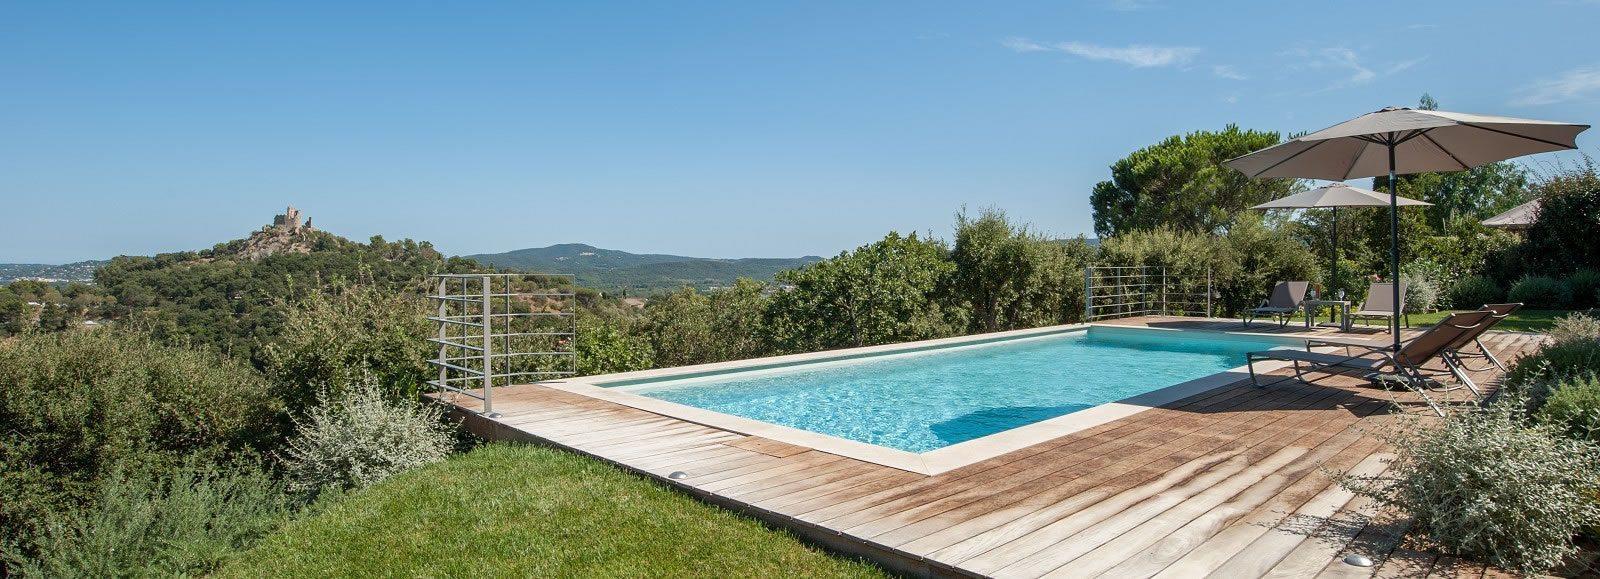 Villa Exceptionnelle Var Piscine